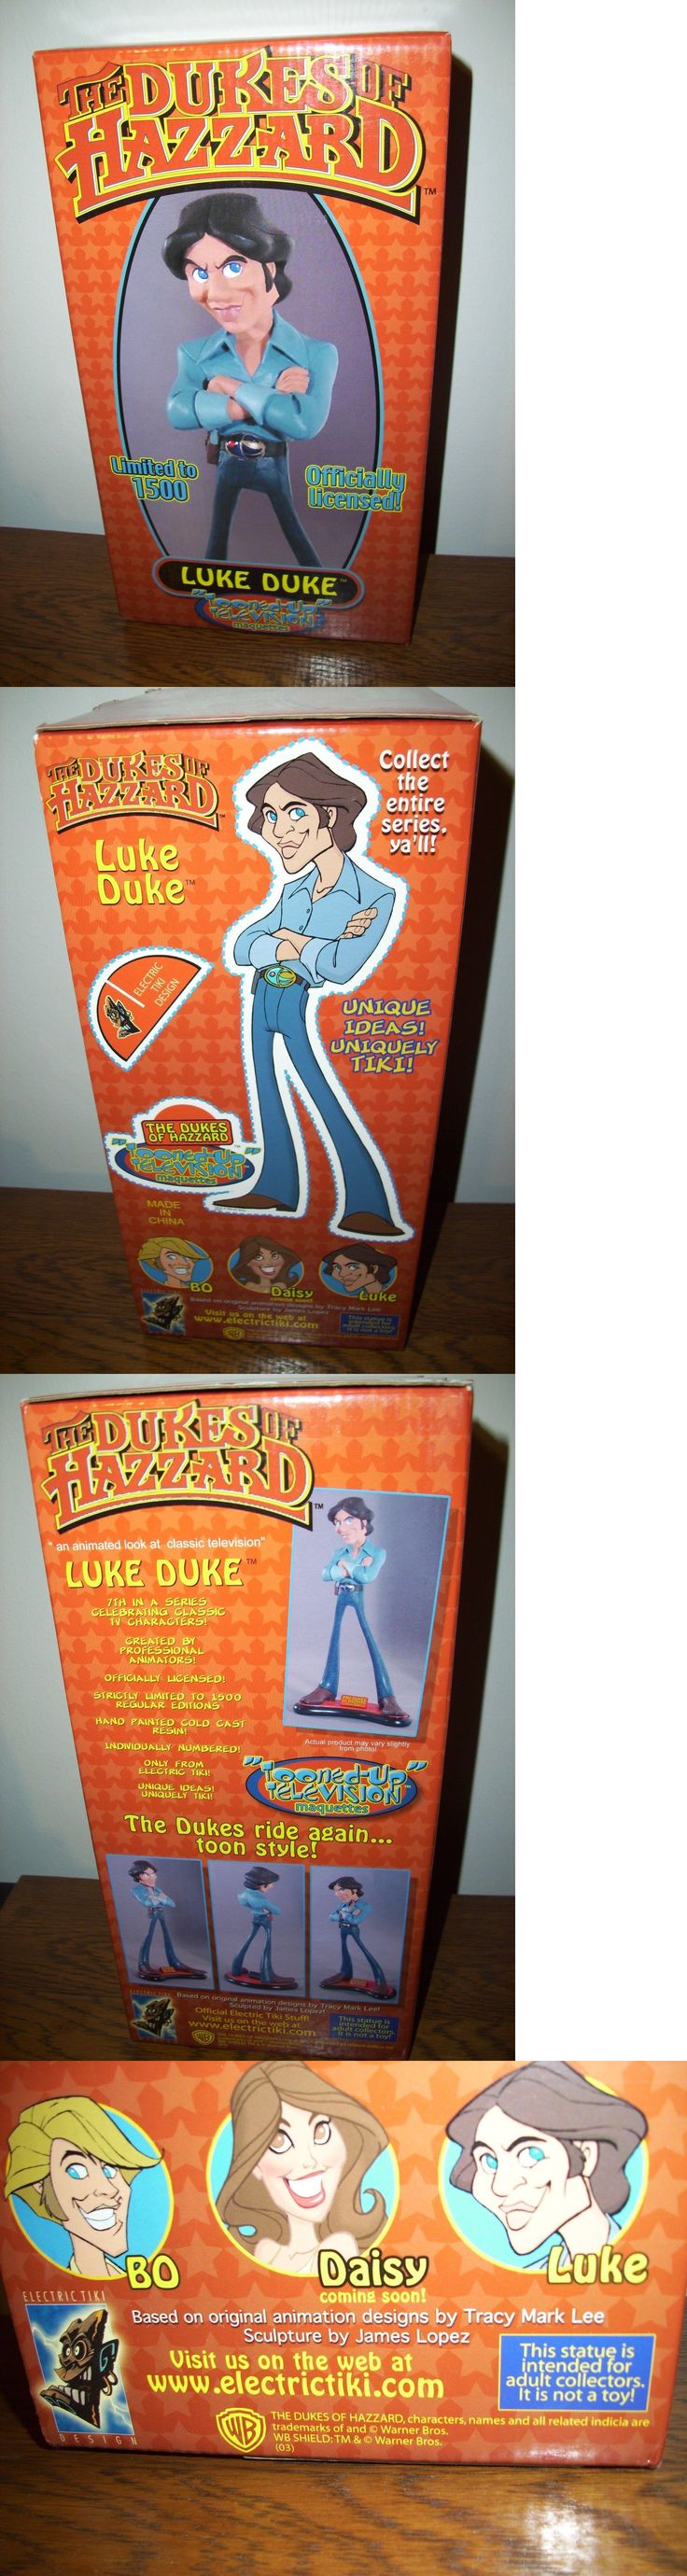 Dukes of Hazzard 20908: Rare Dukes Of Hazzard Luke Duke Electric Tiki Tooned Up Maquette Statue -New -> BUY IT NOW ONLY: $199.99 on eBay!